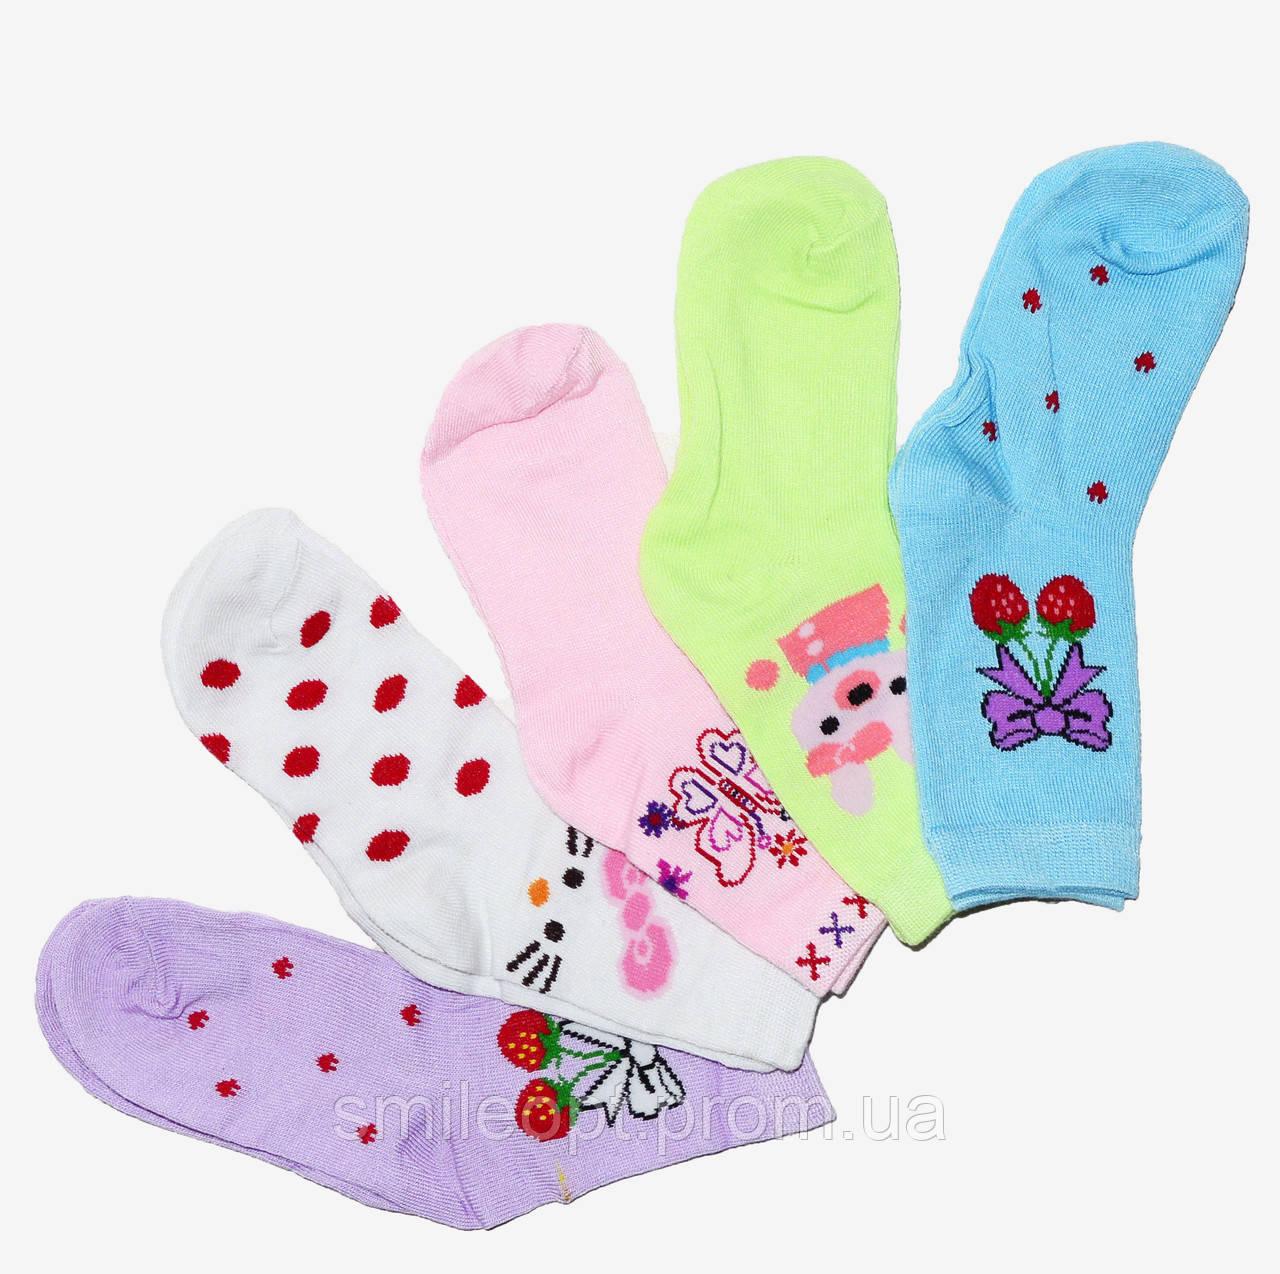 0847219c996e4 Детские носочки на девочку с красивыми узорами (ND3102): продажа ...